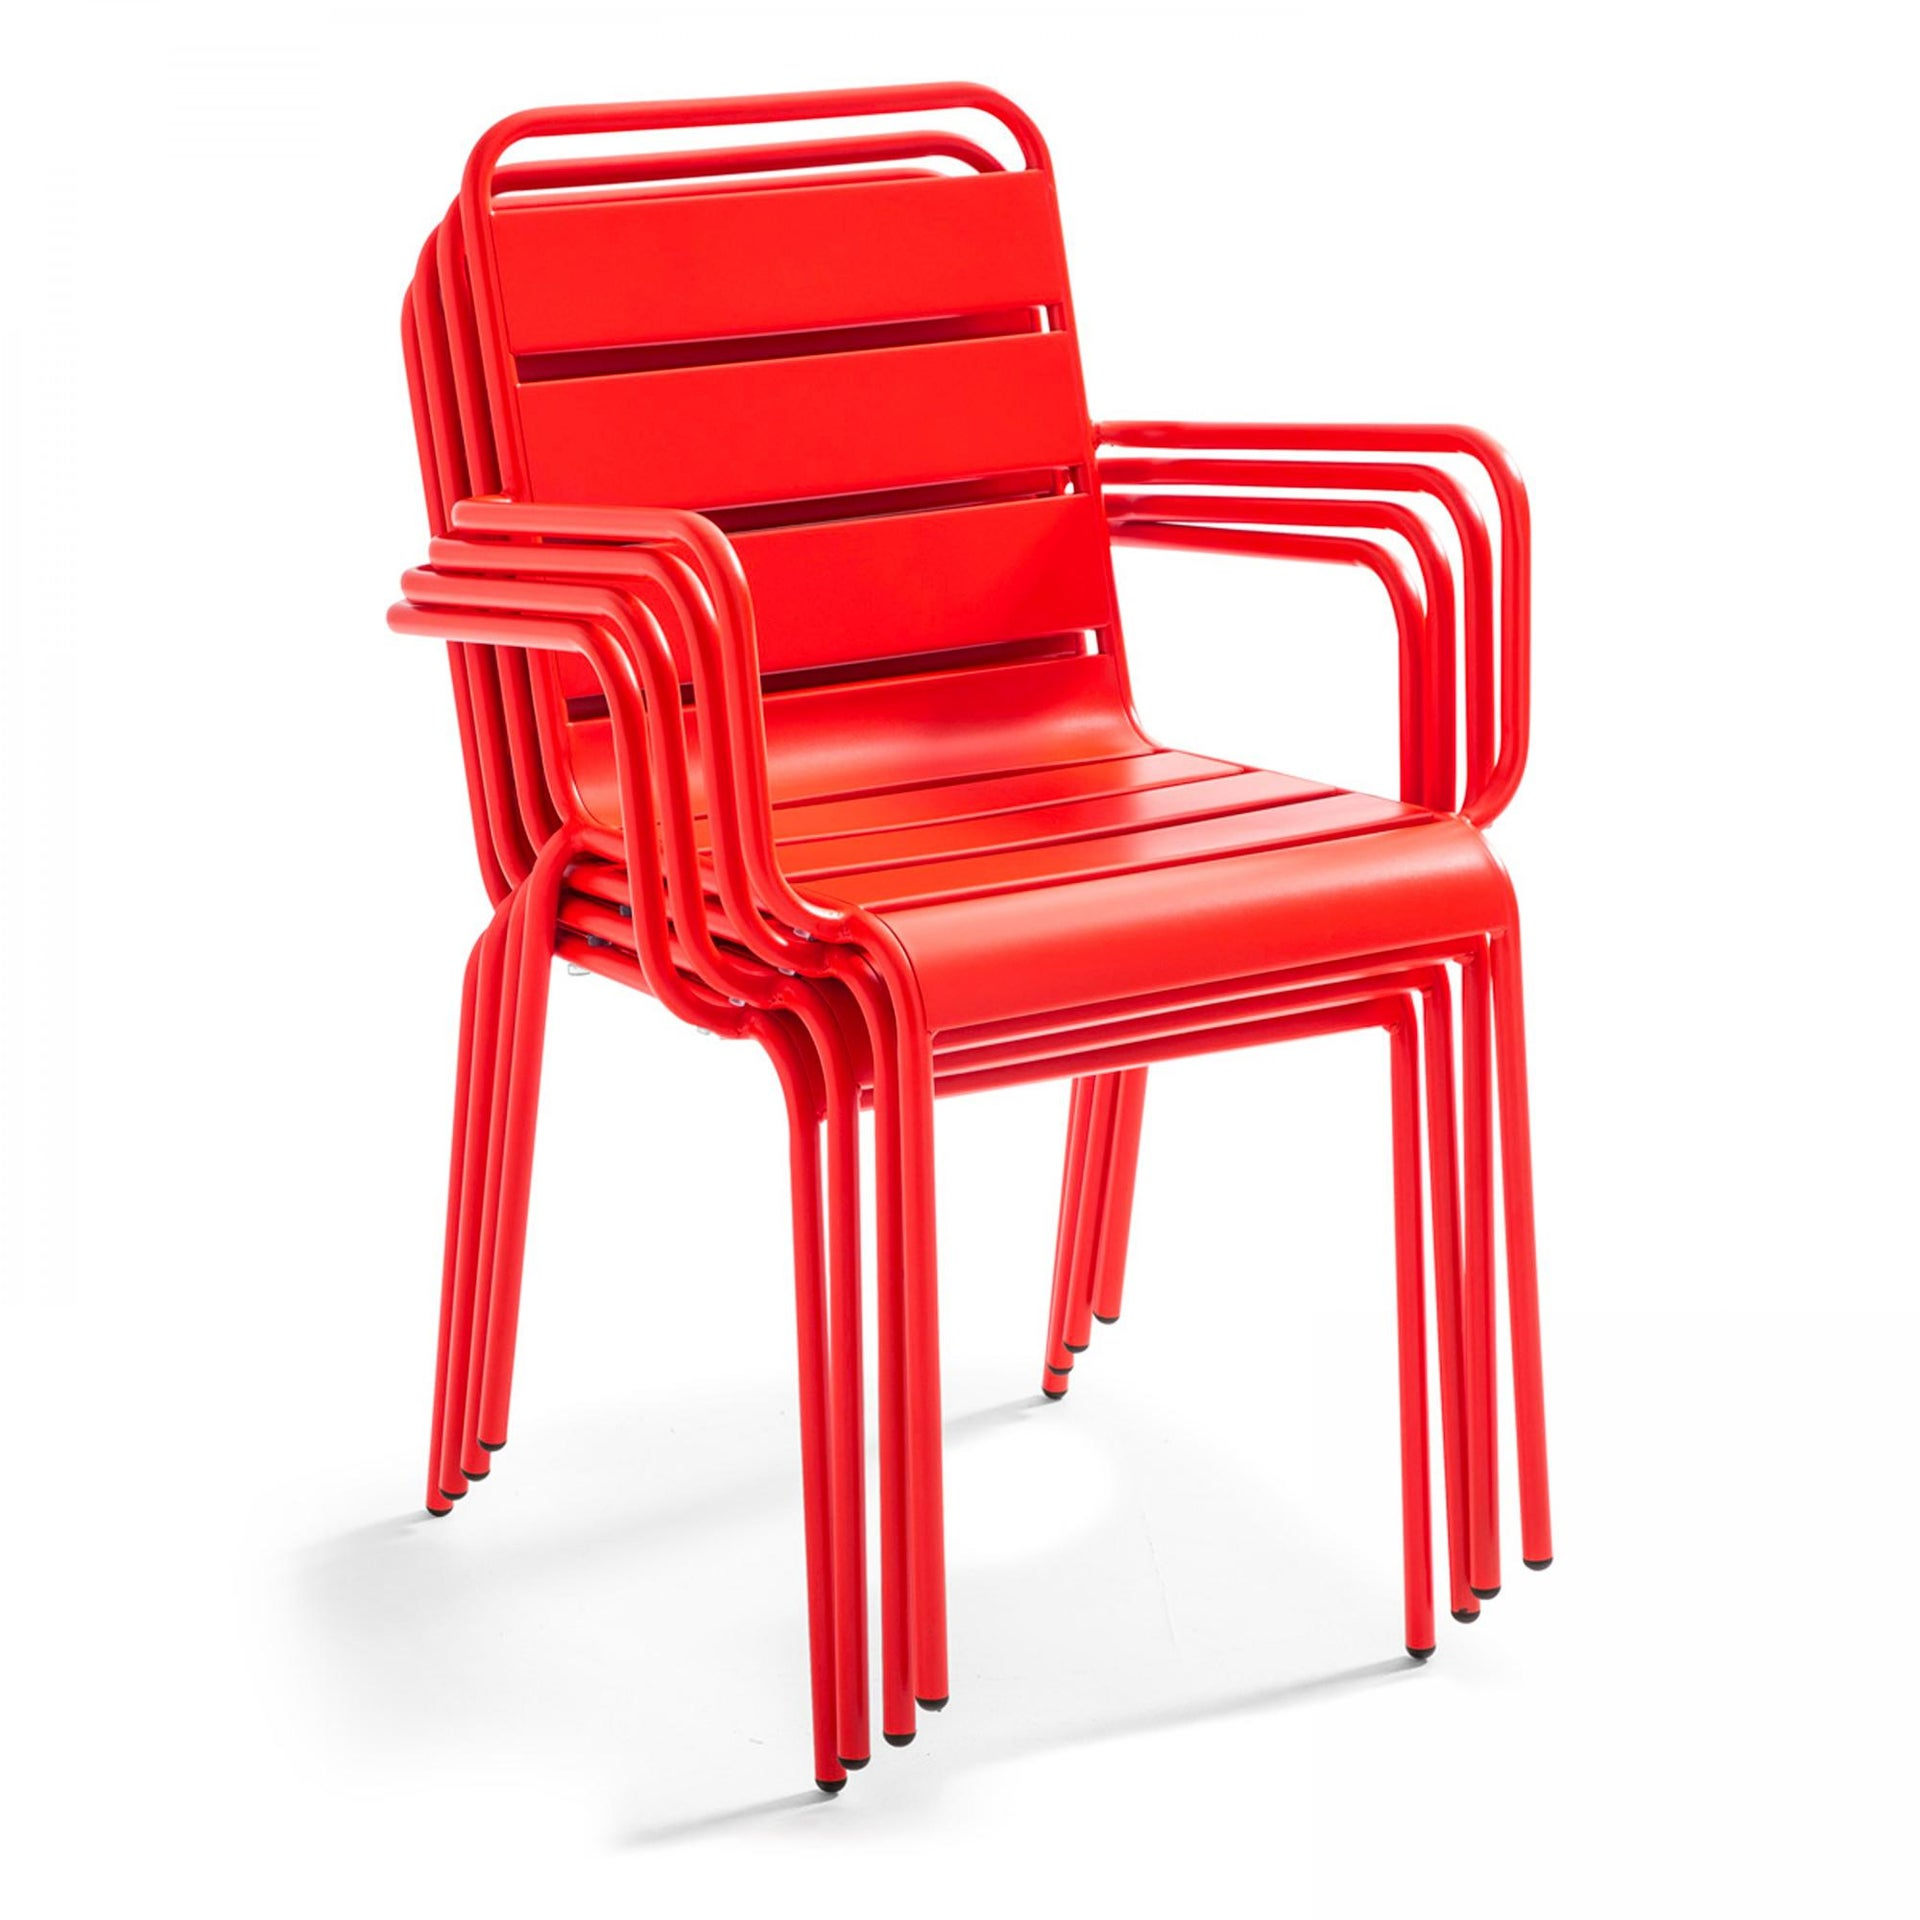 chaise de jardin acier 103591 rouge  leroy merlin